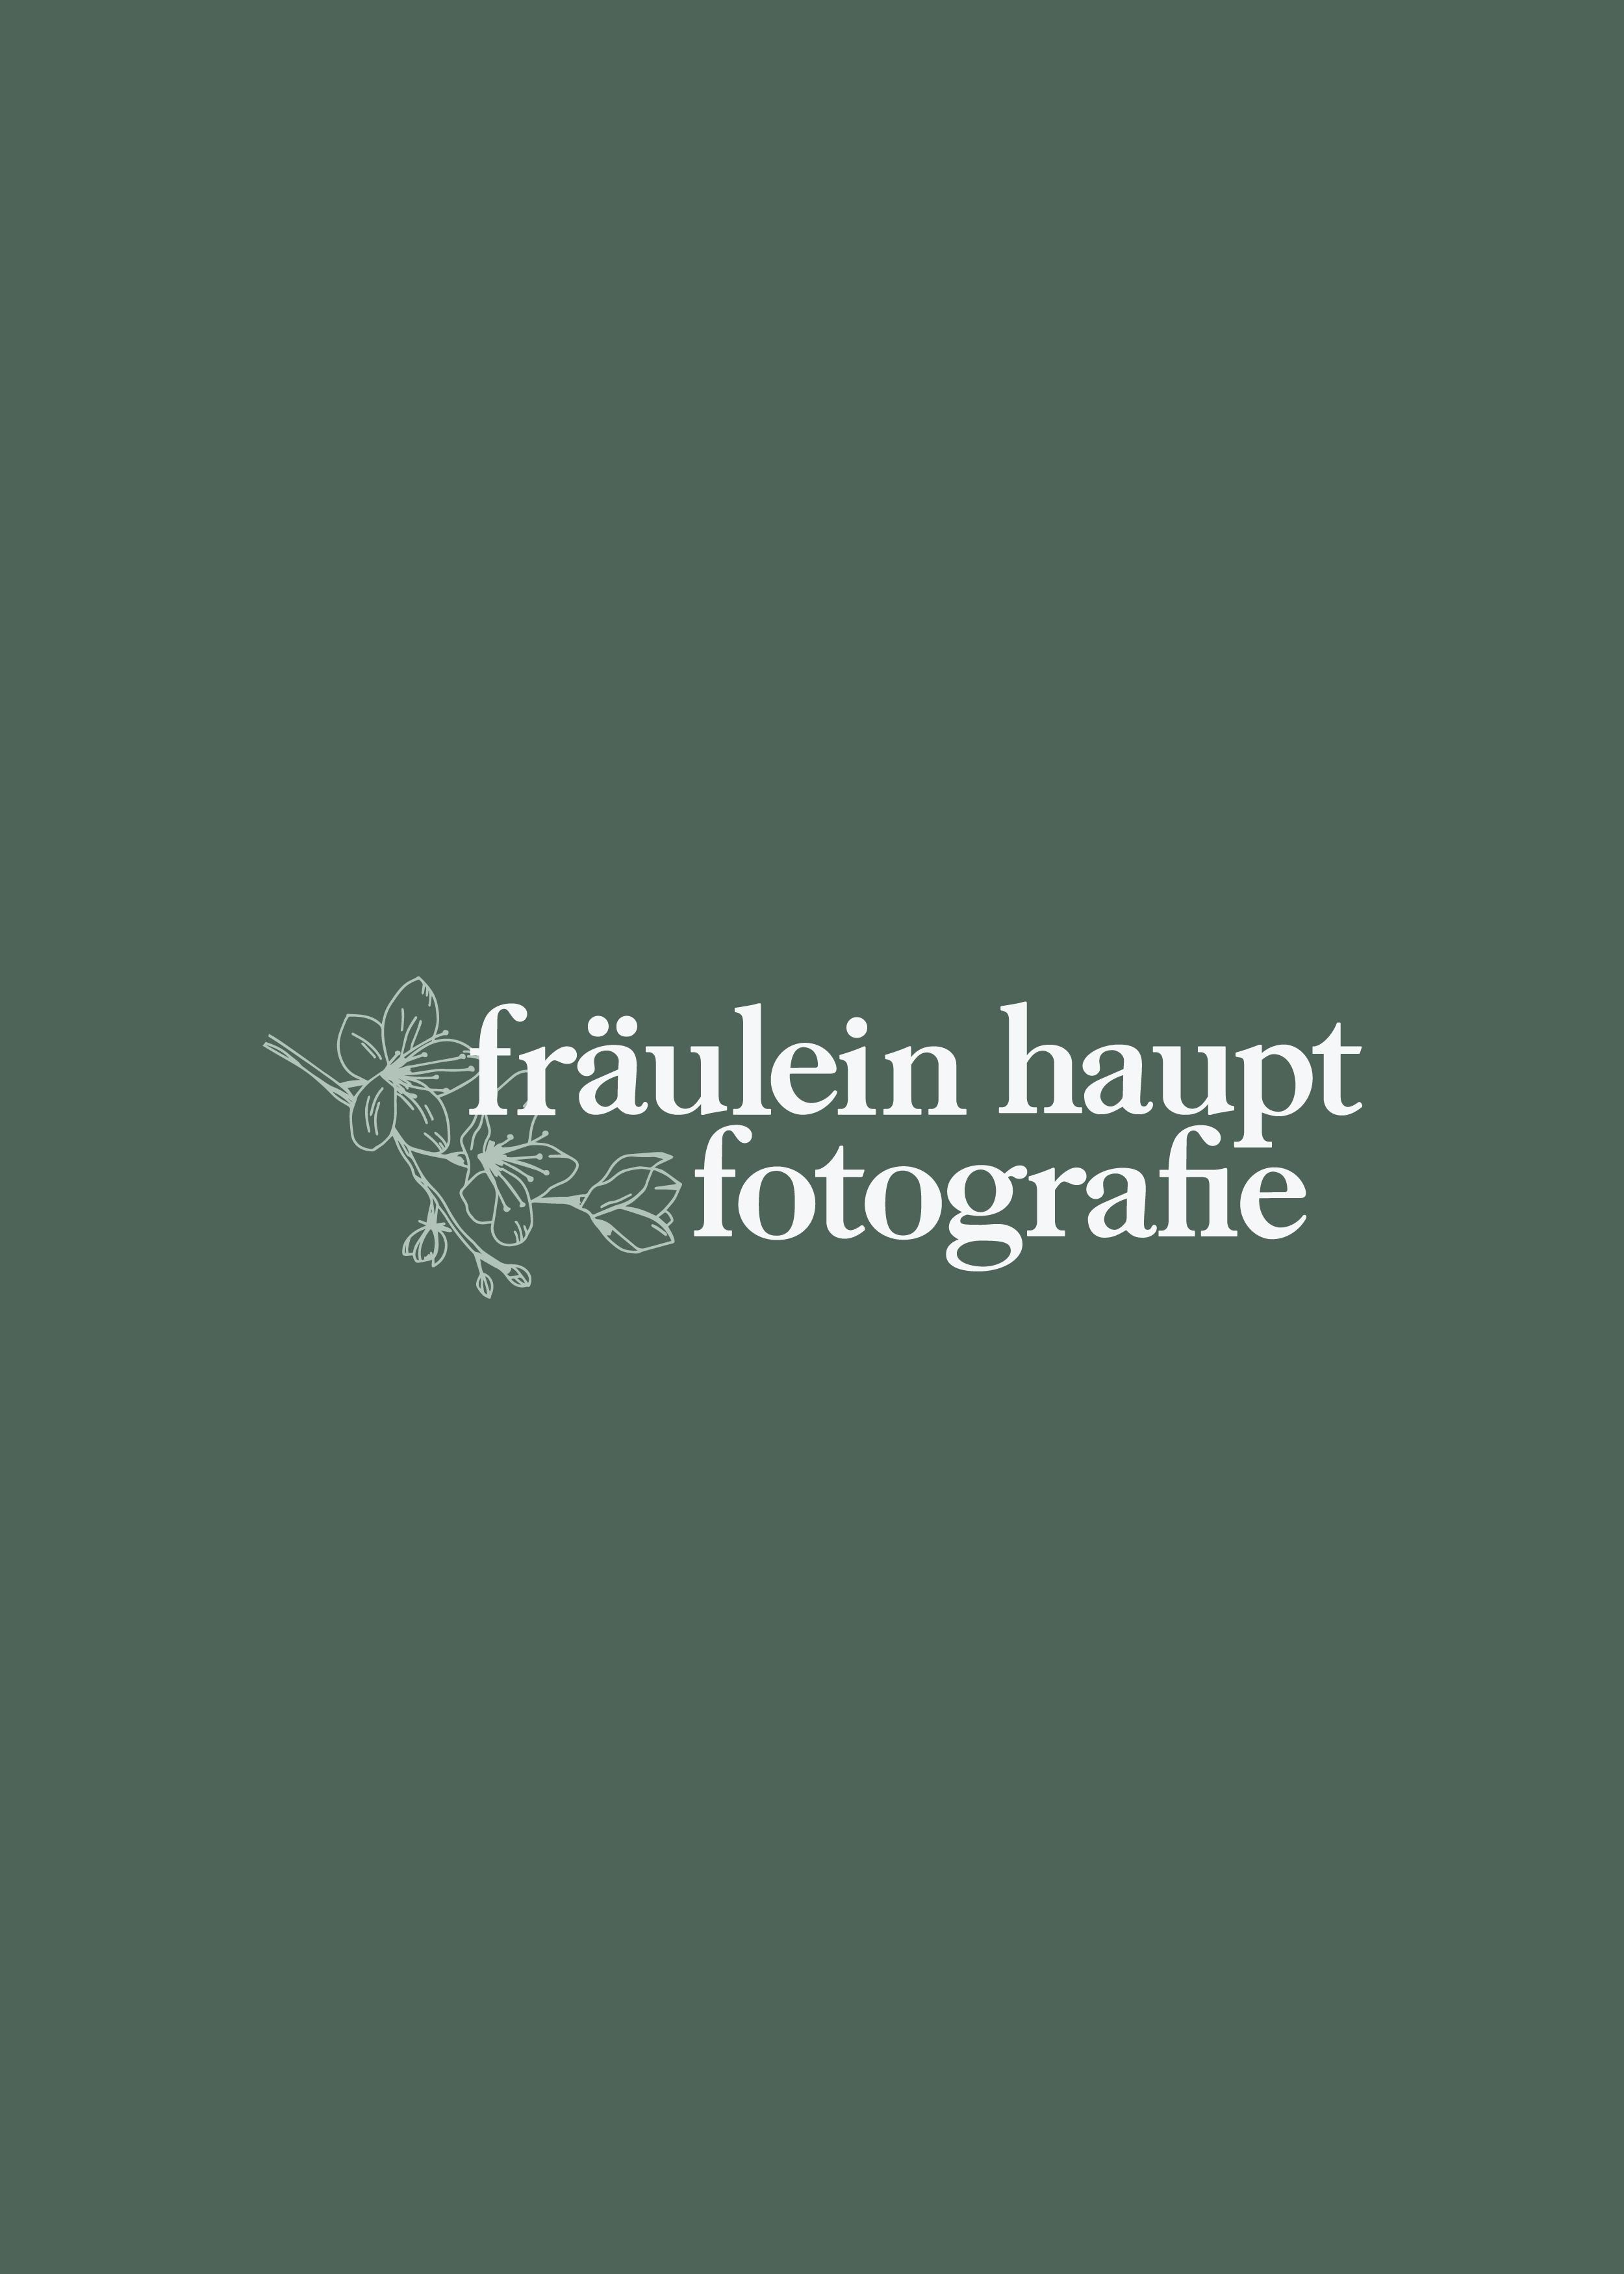 FHF_ArtDirection_BrandDesign.png